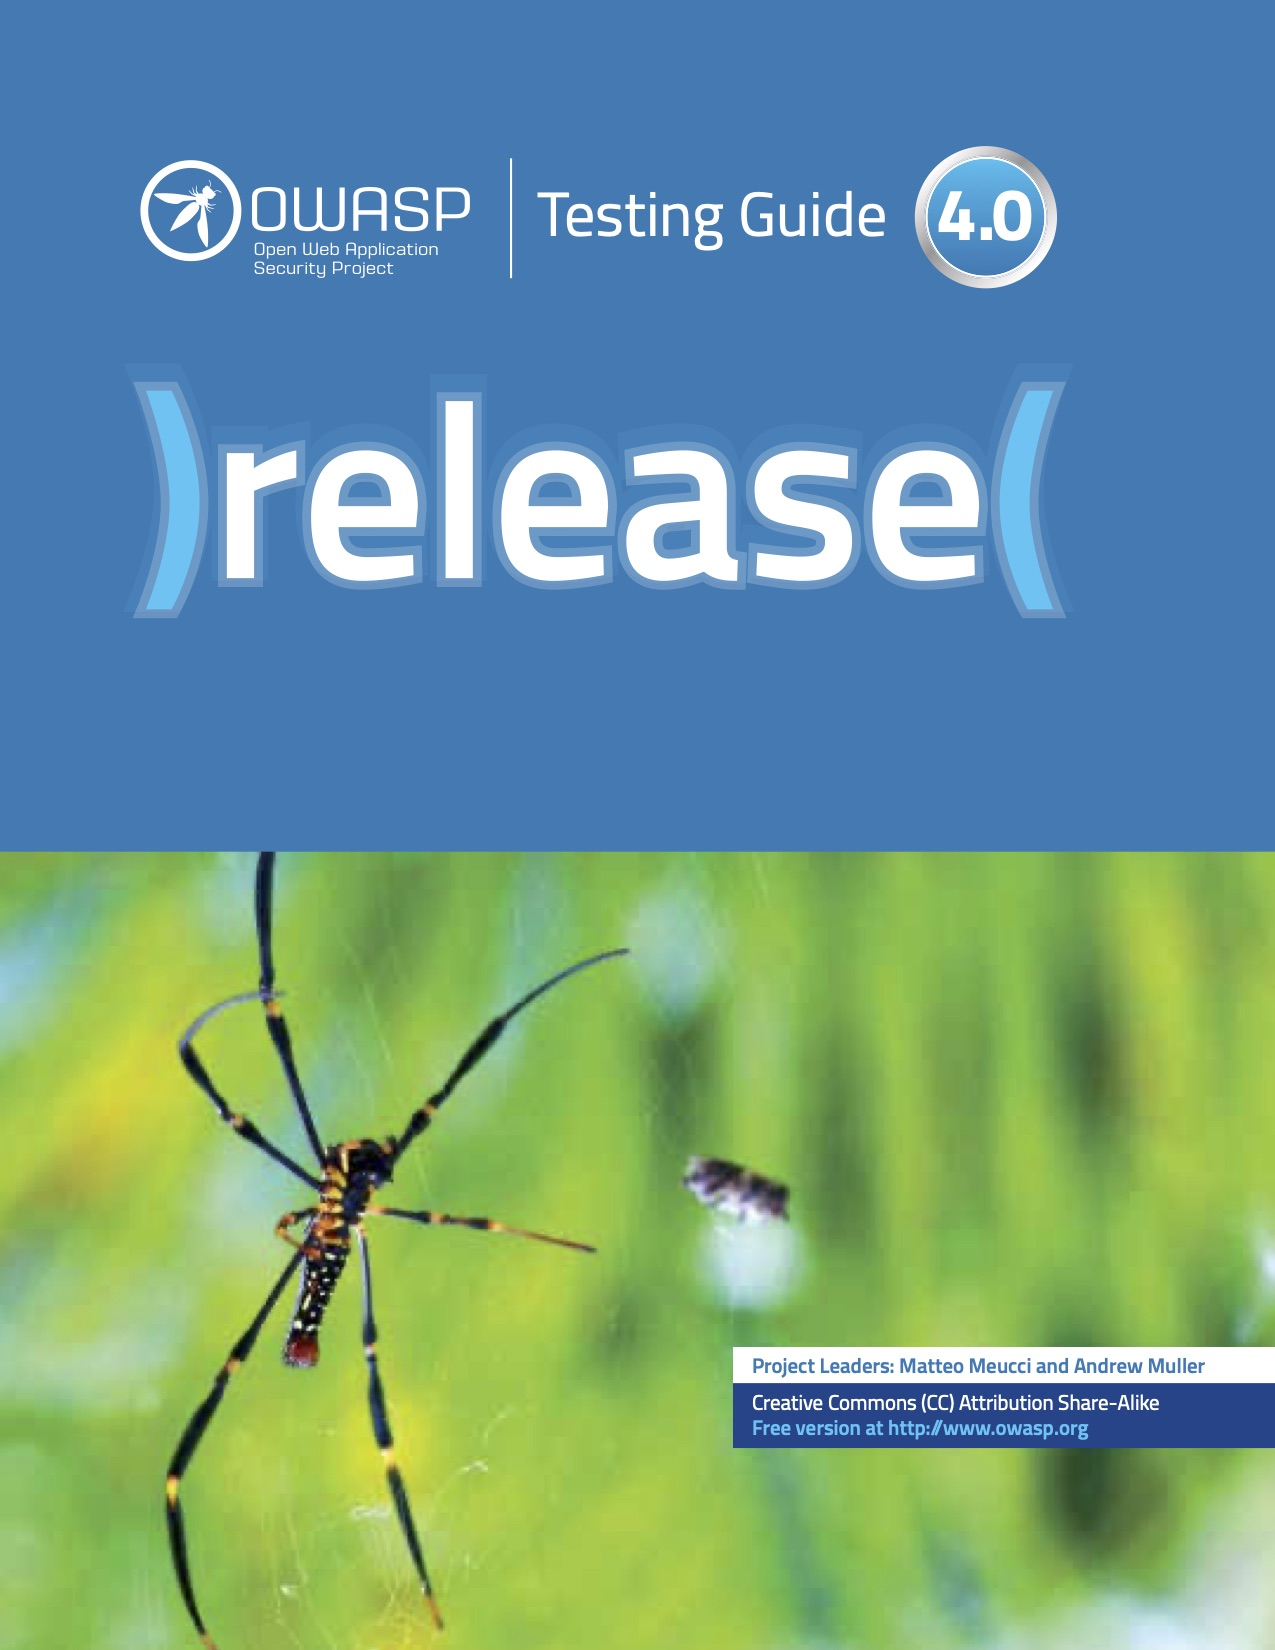 OWASP Test Guide v4